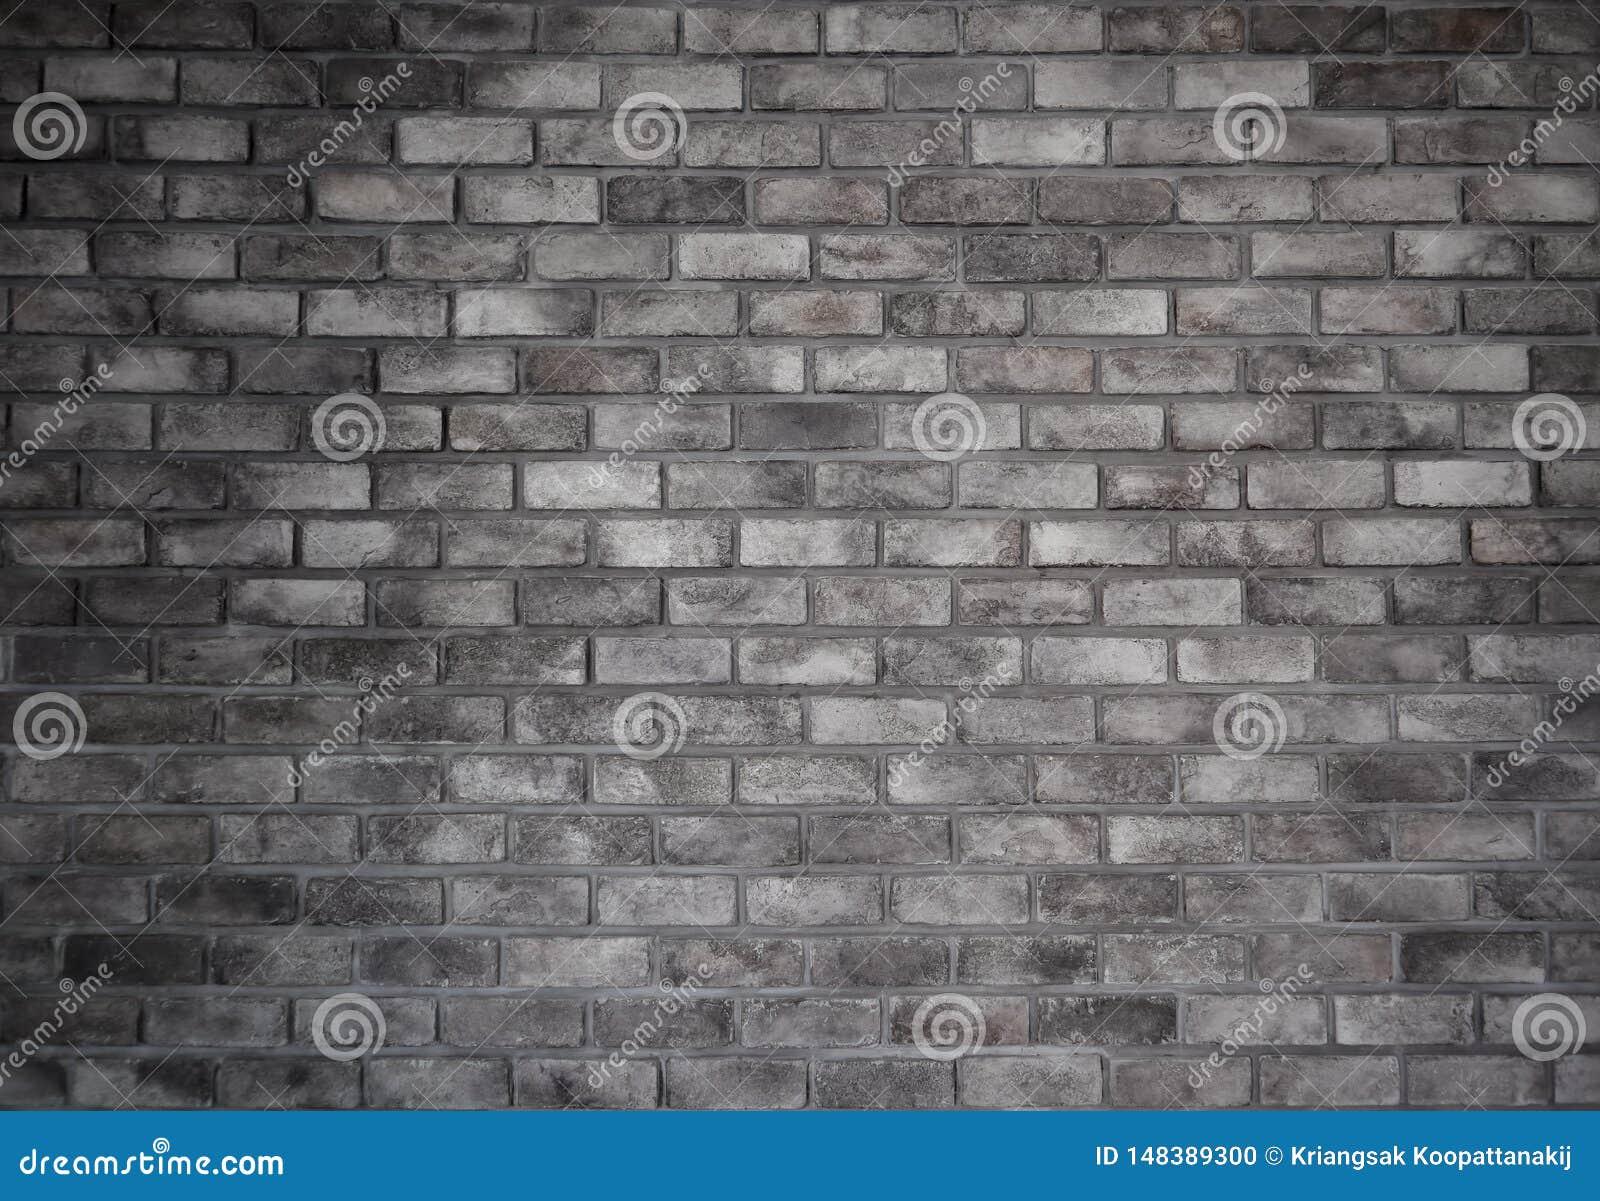 Retro style of old brick gray wall